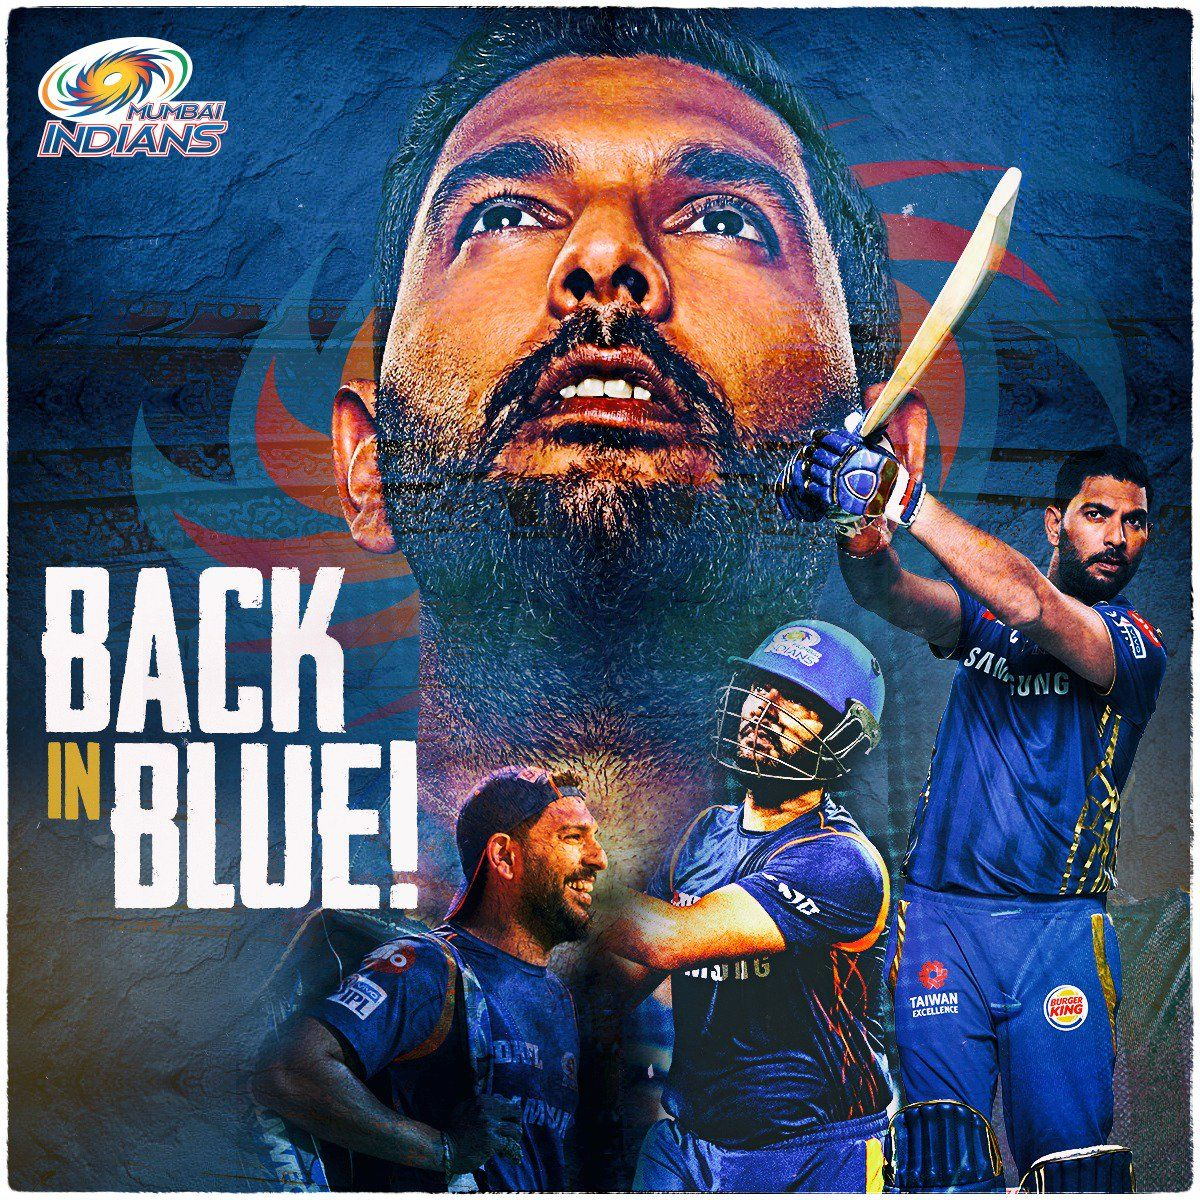 Hello world! Cricket sport, Dhoni wallpapers, Mumbai indians